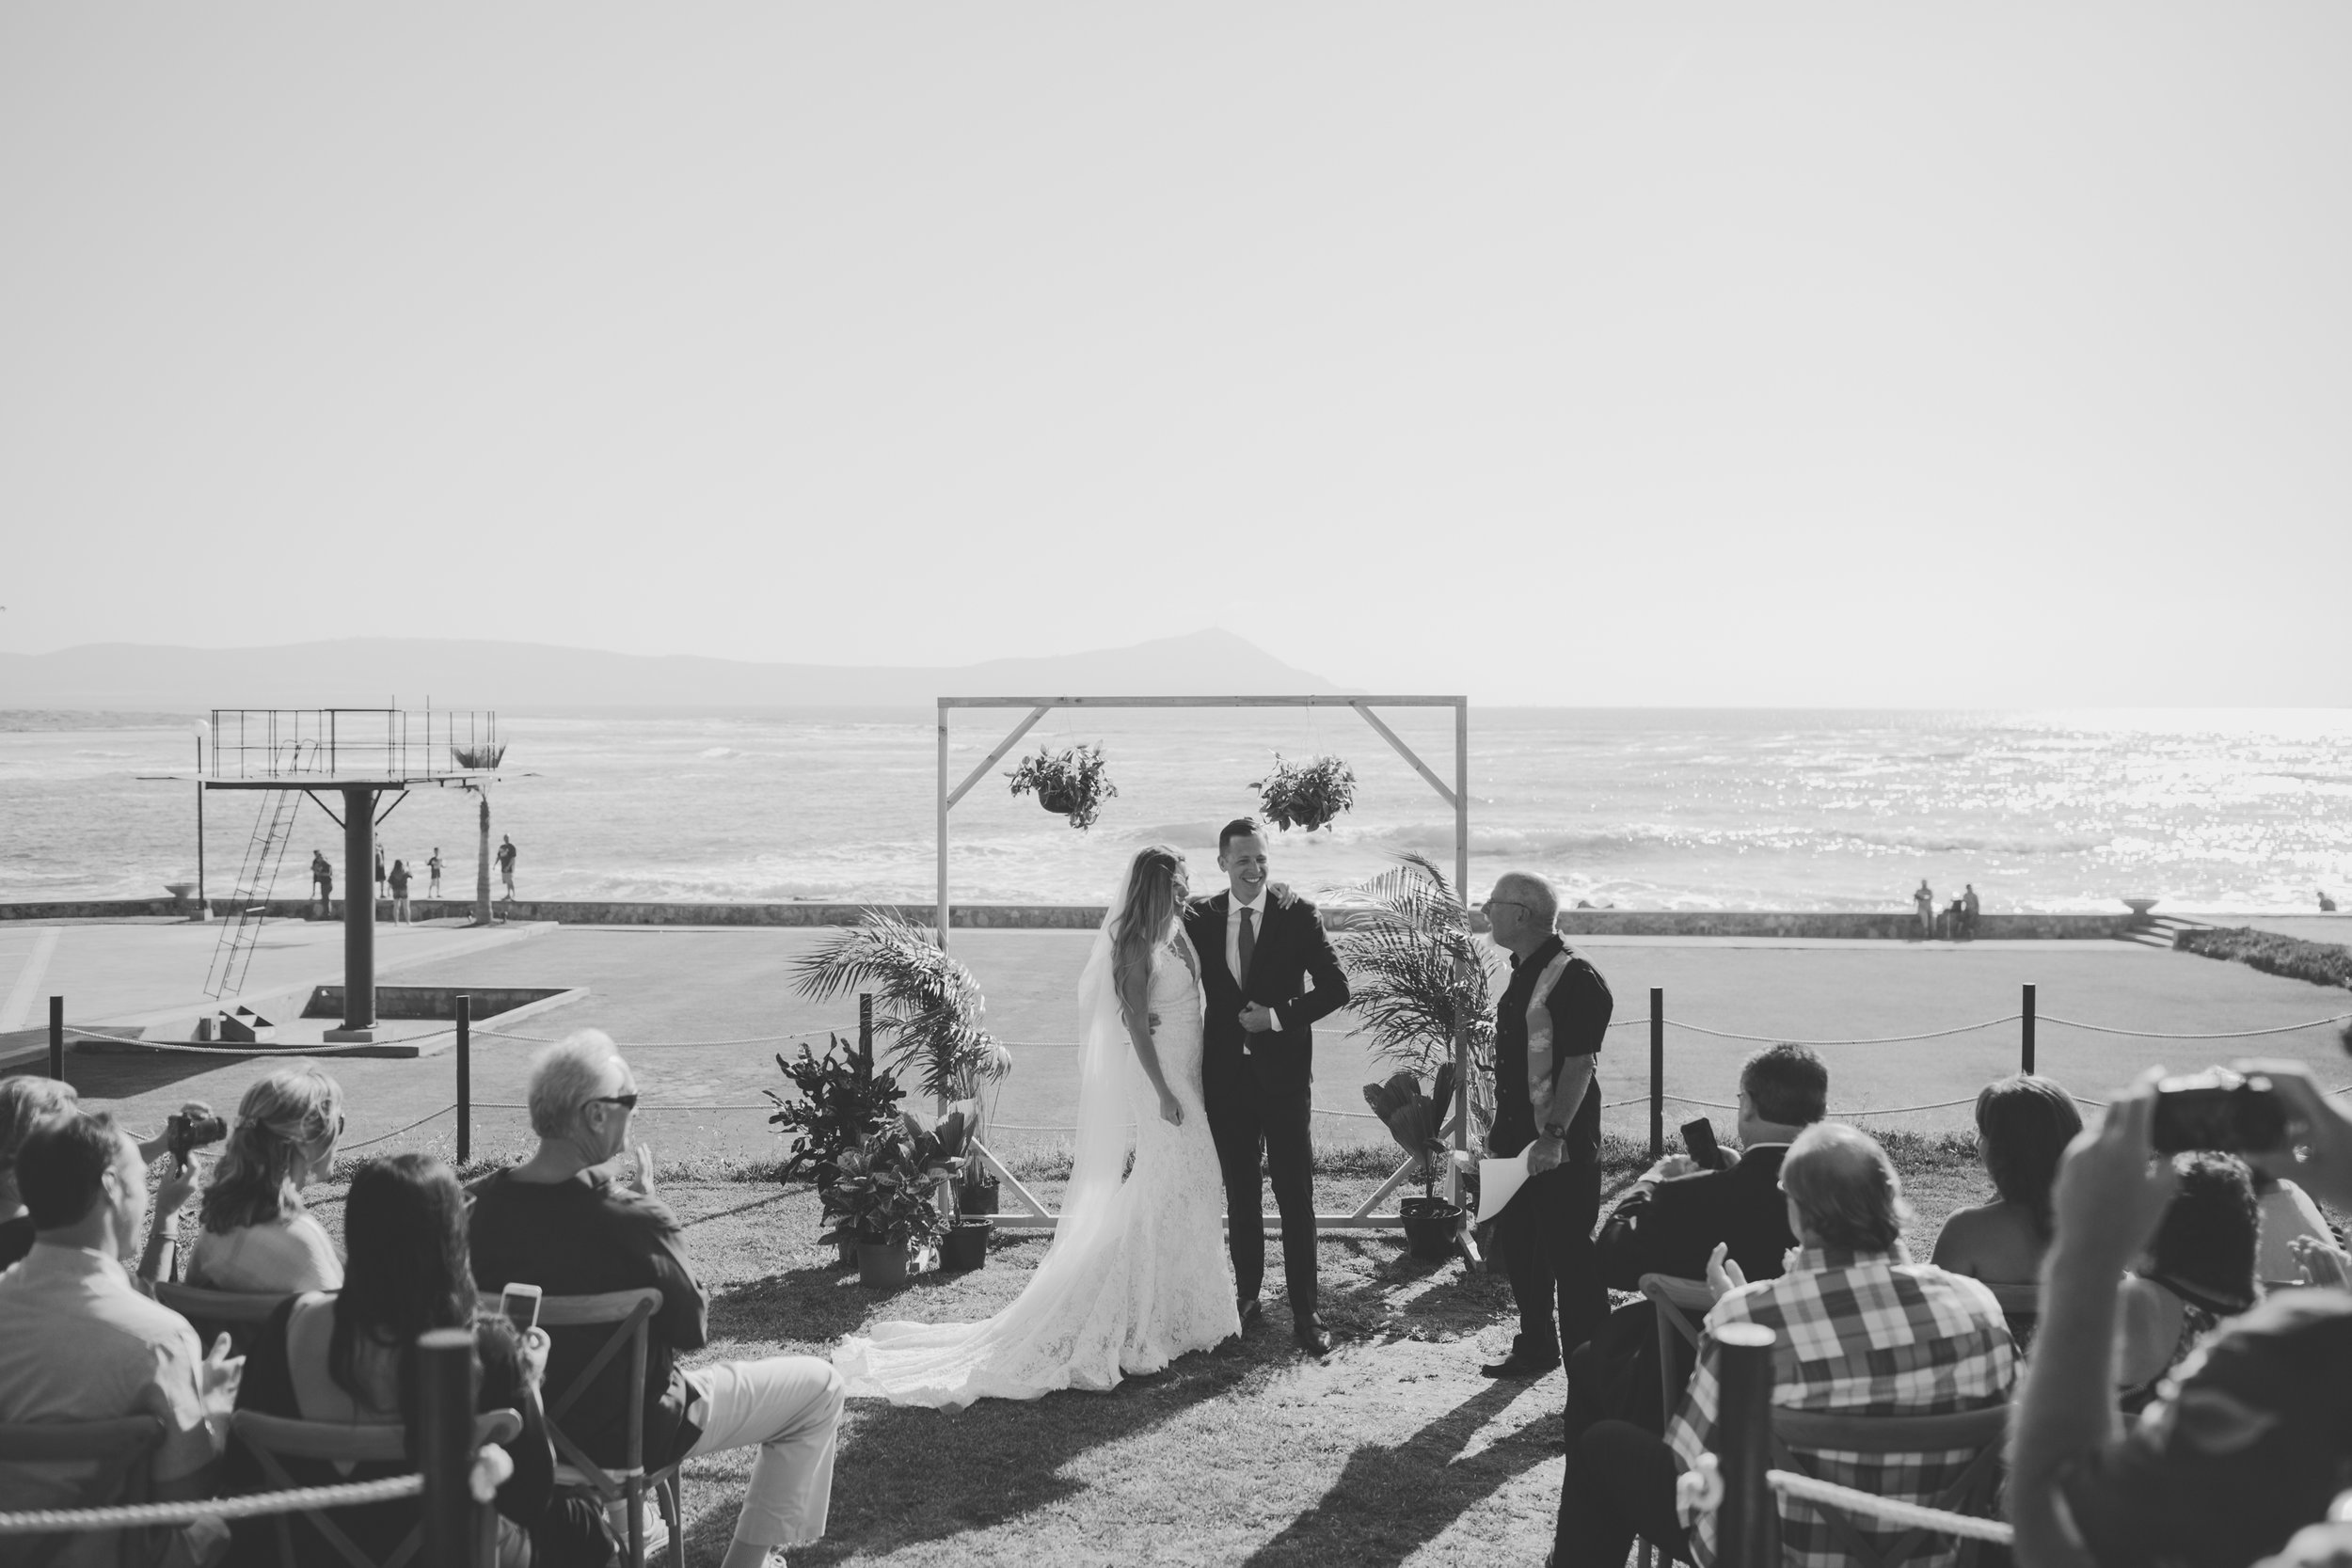 amandavanvels_ensenada_mexico_wedding_048.jpg